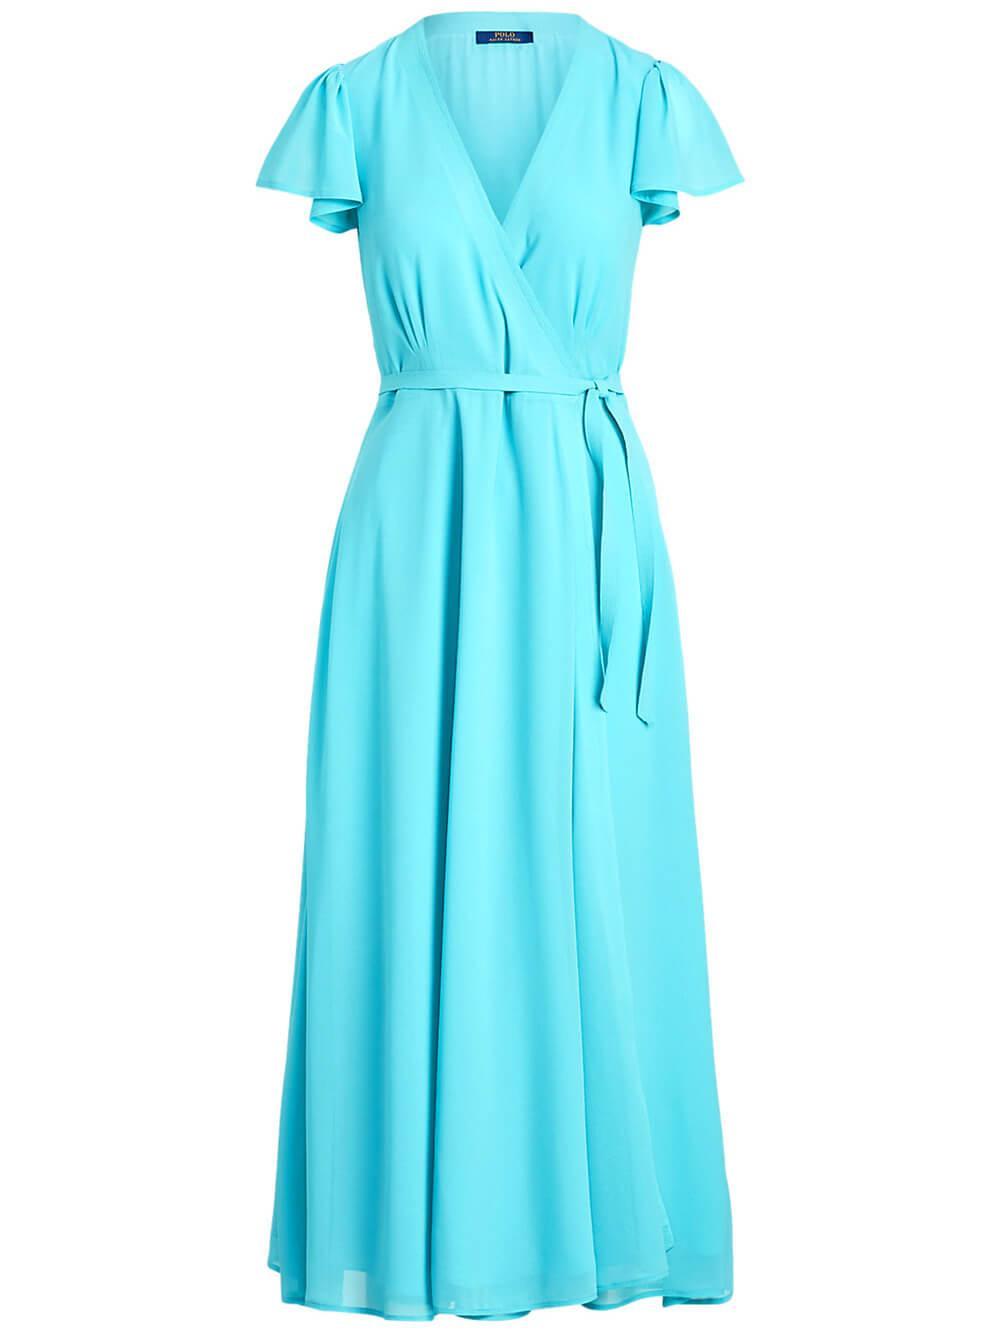 Carmen Wrap Dress Item # 211800597001